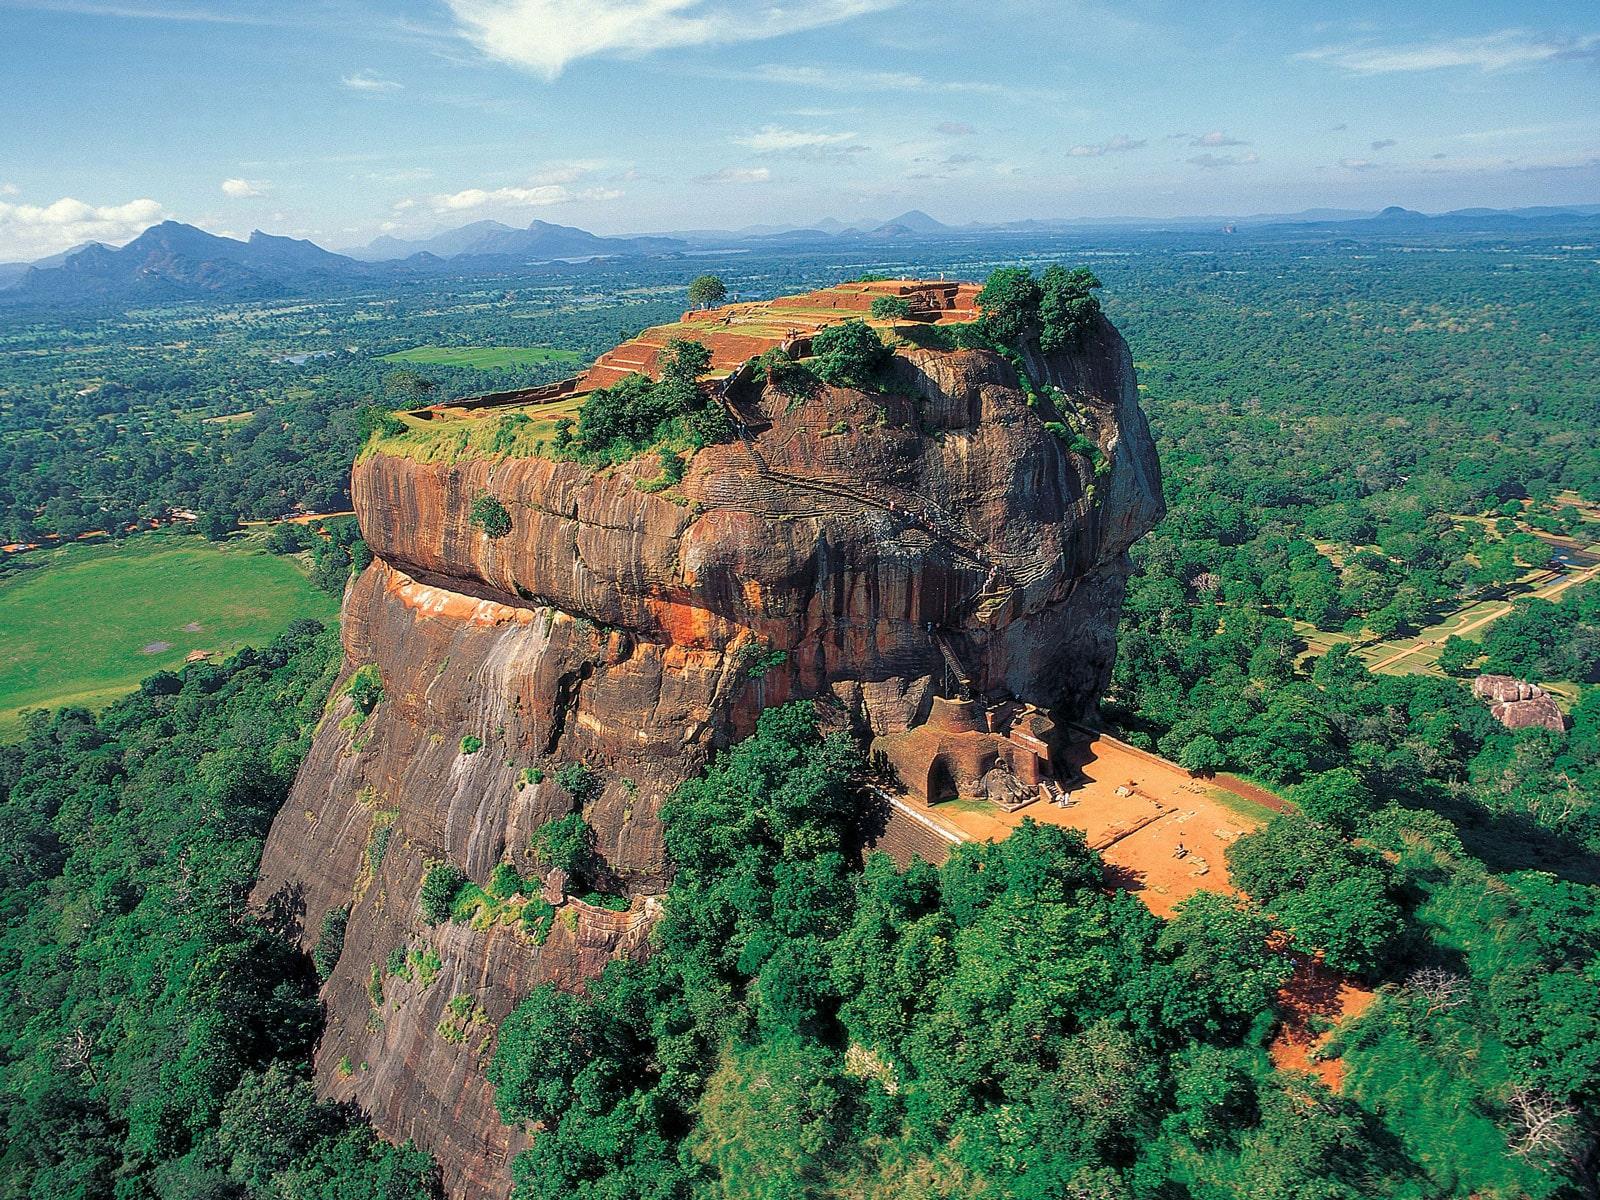 rondreis sri lanka centrale hooglanden blog 4